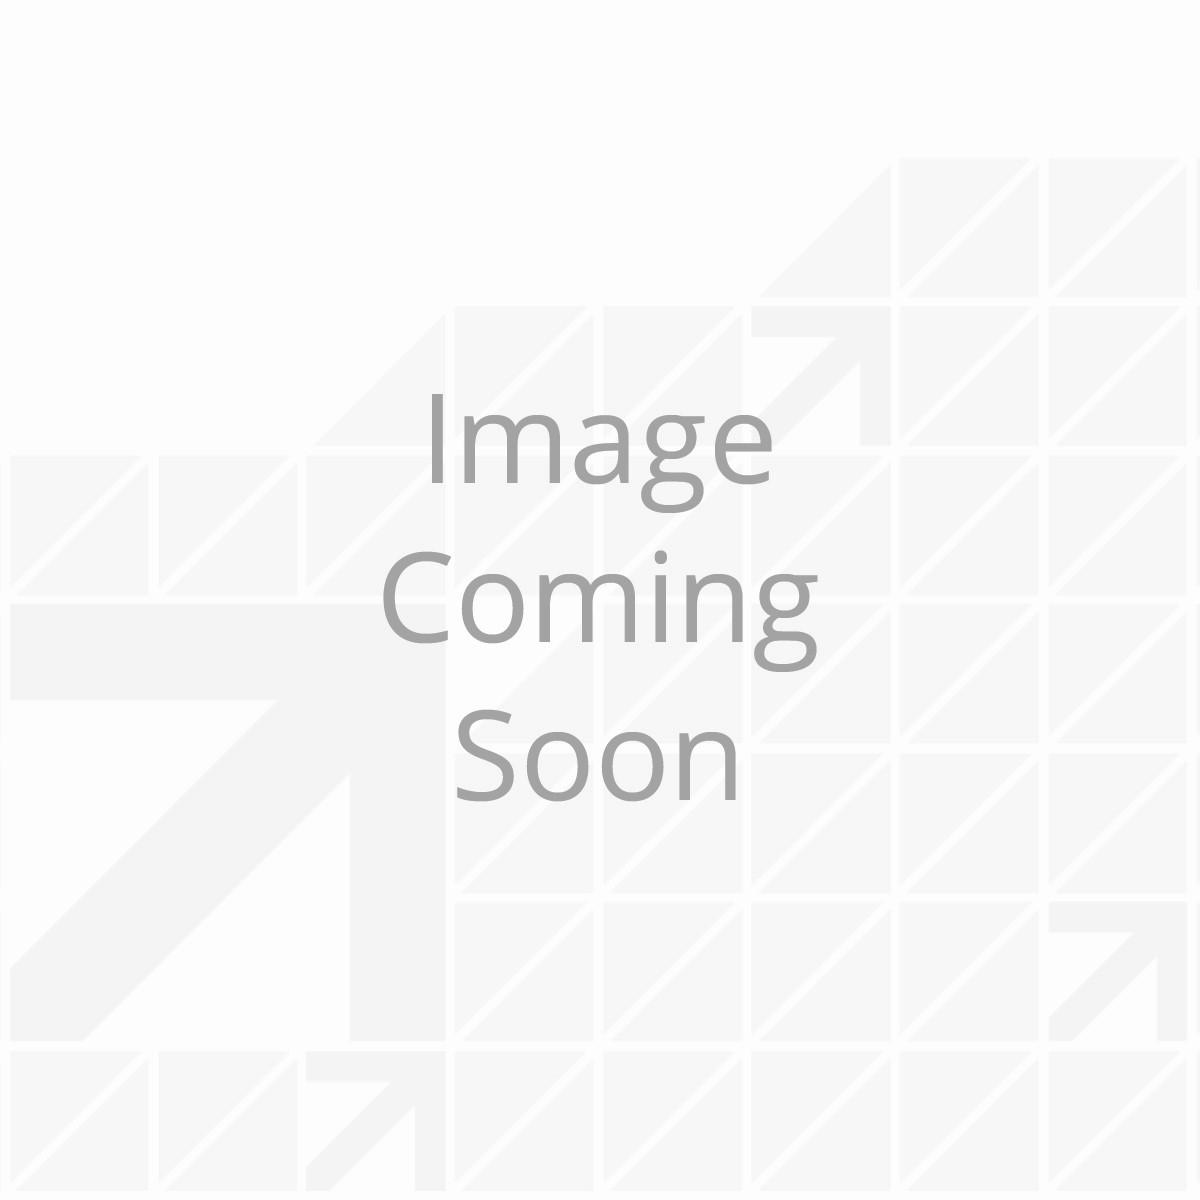 LCI Leveling Control Brain (12656)